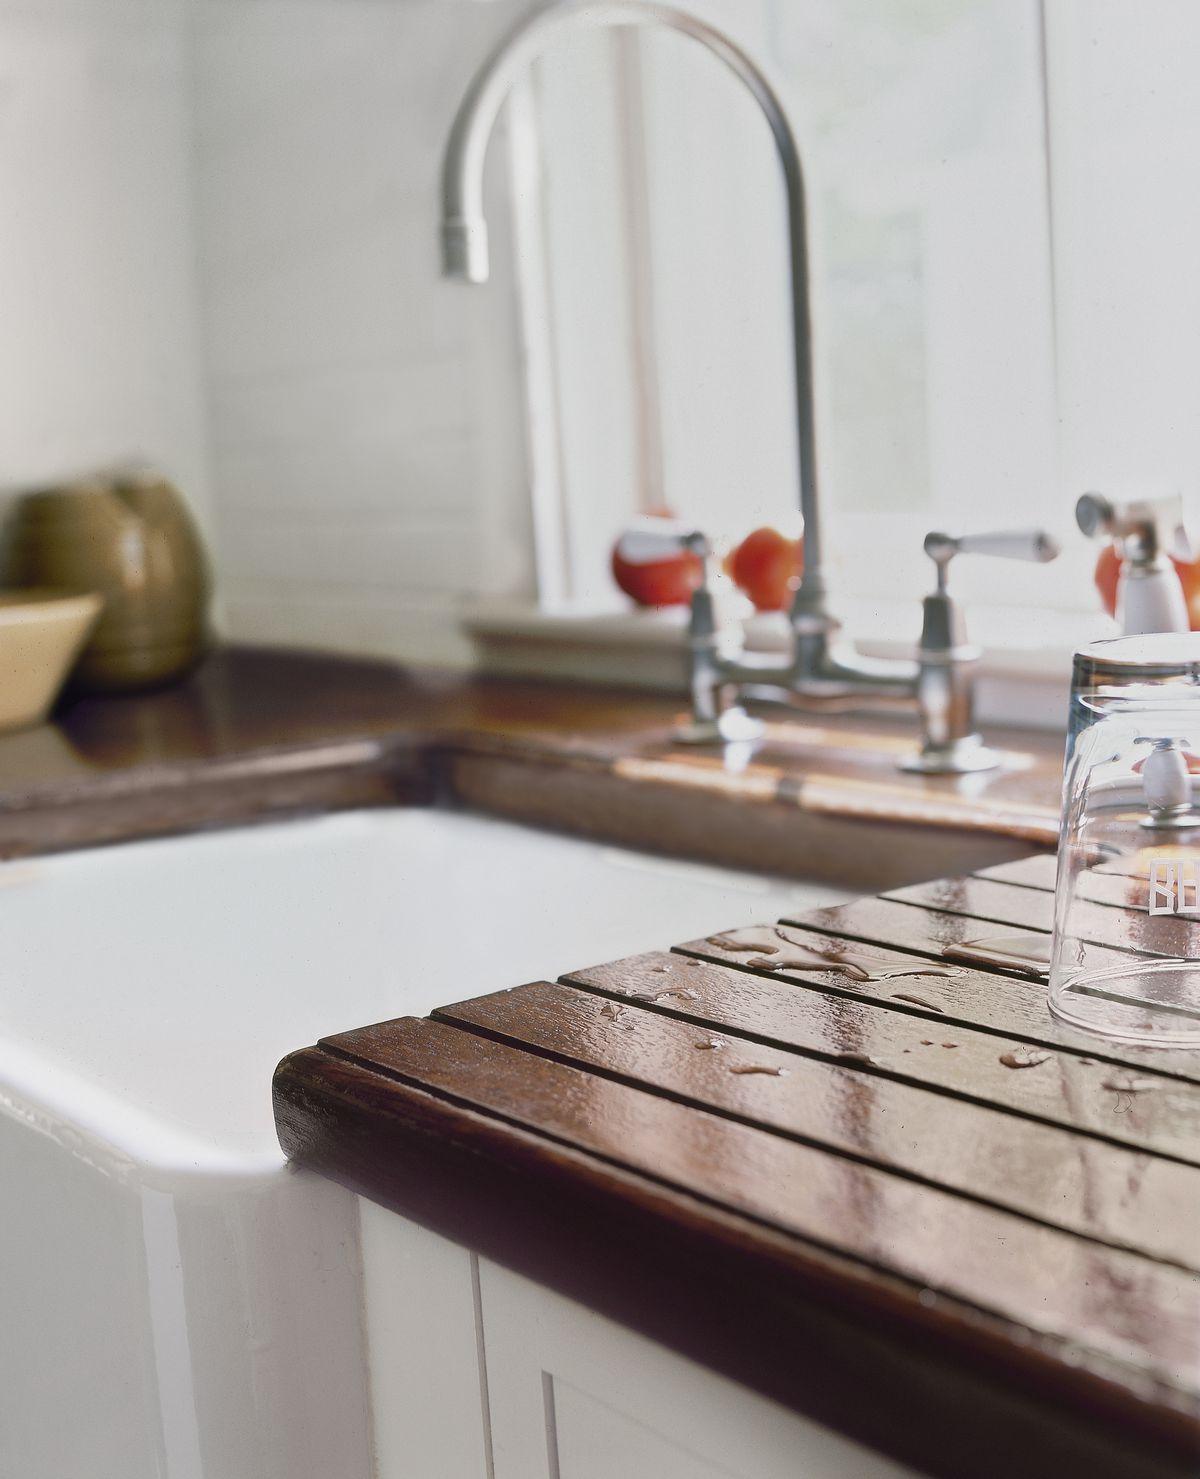 Wet wood countertop by sink.